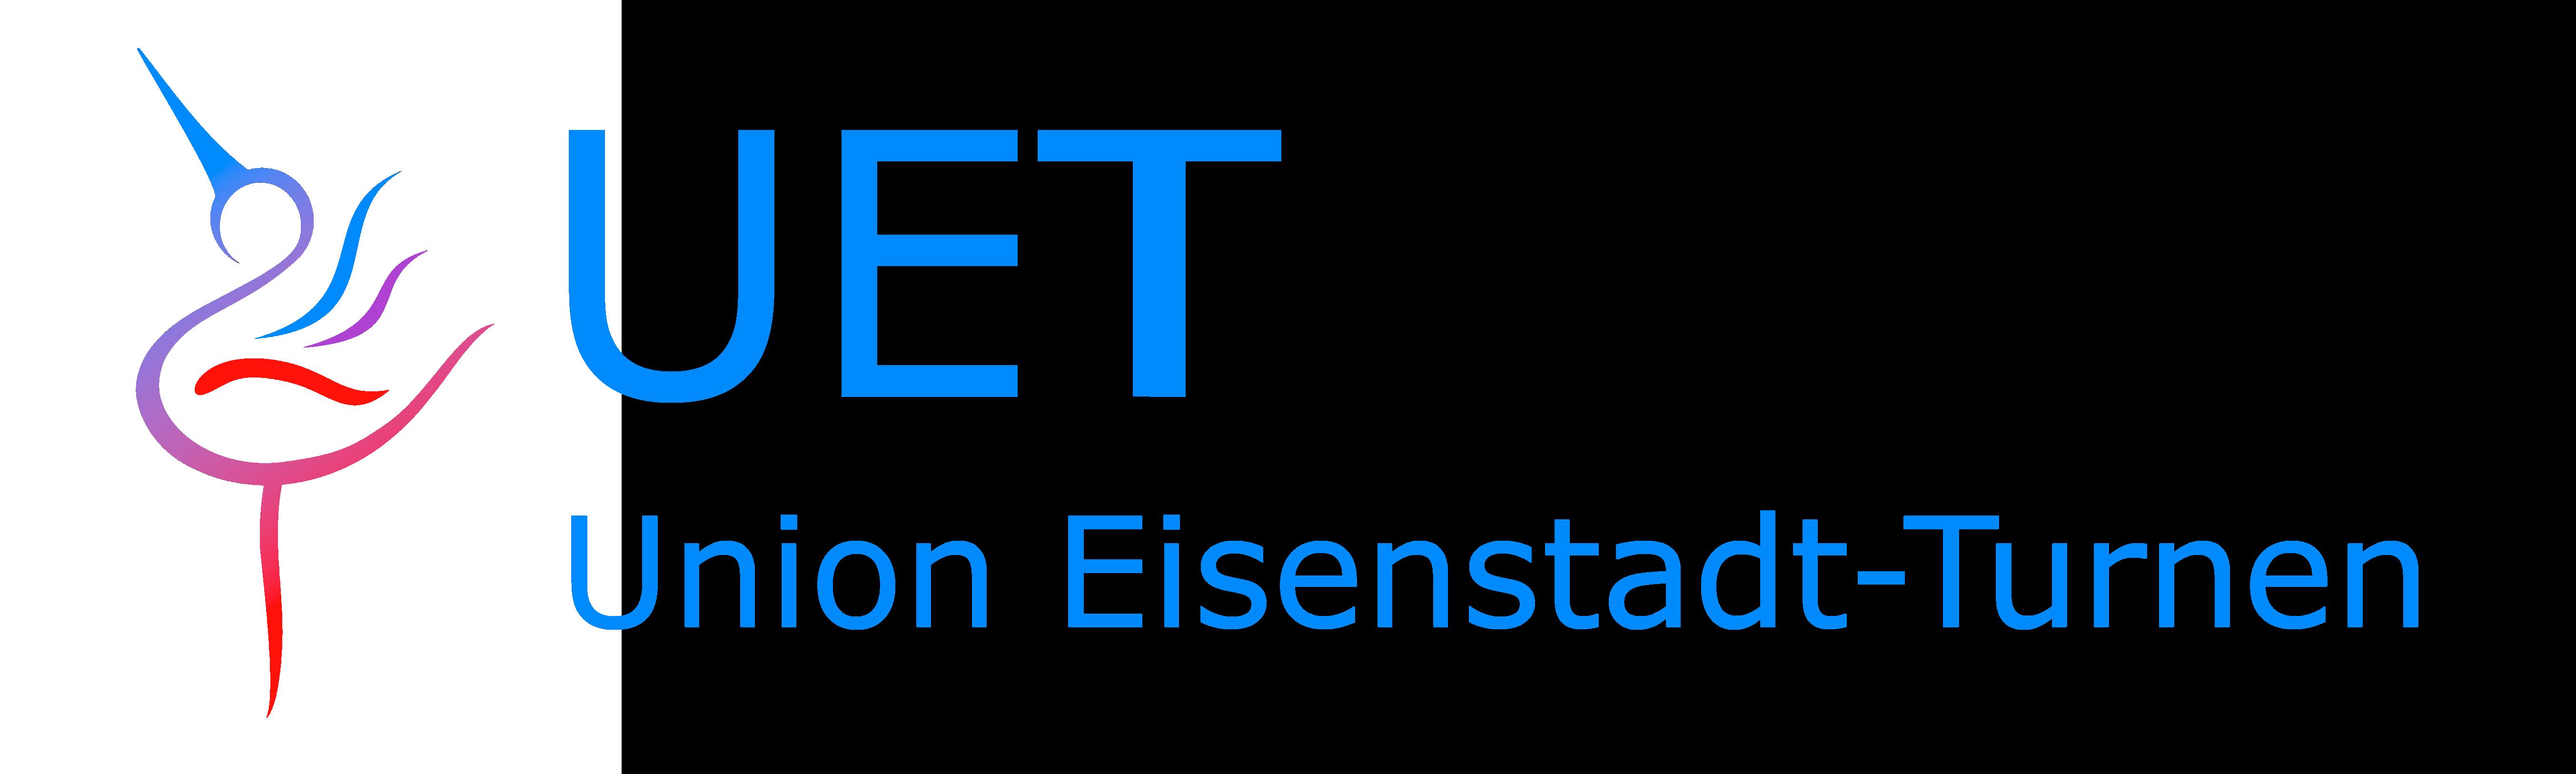 Union Eisenstadt-Turnen